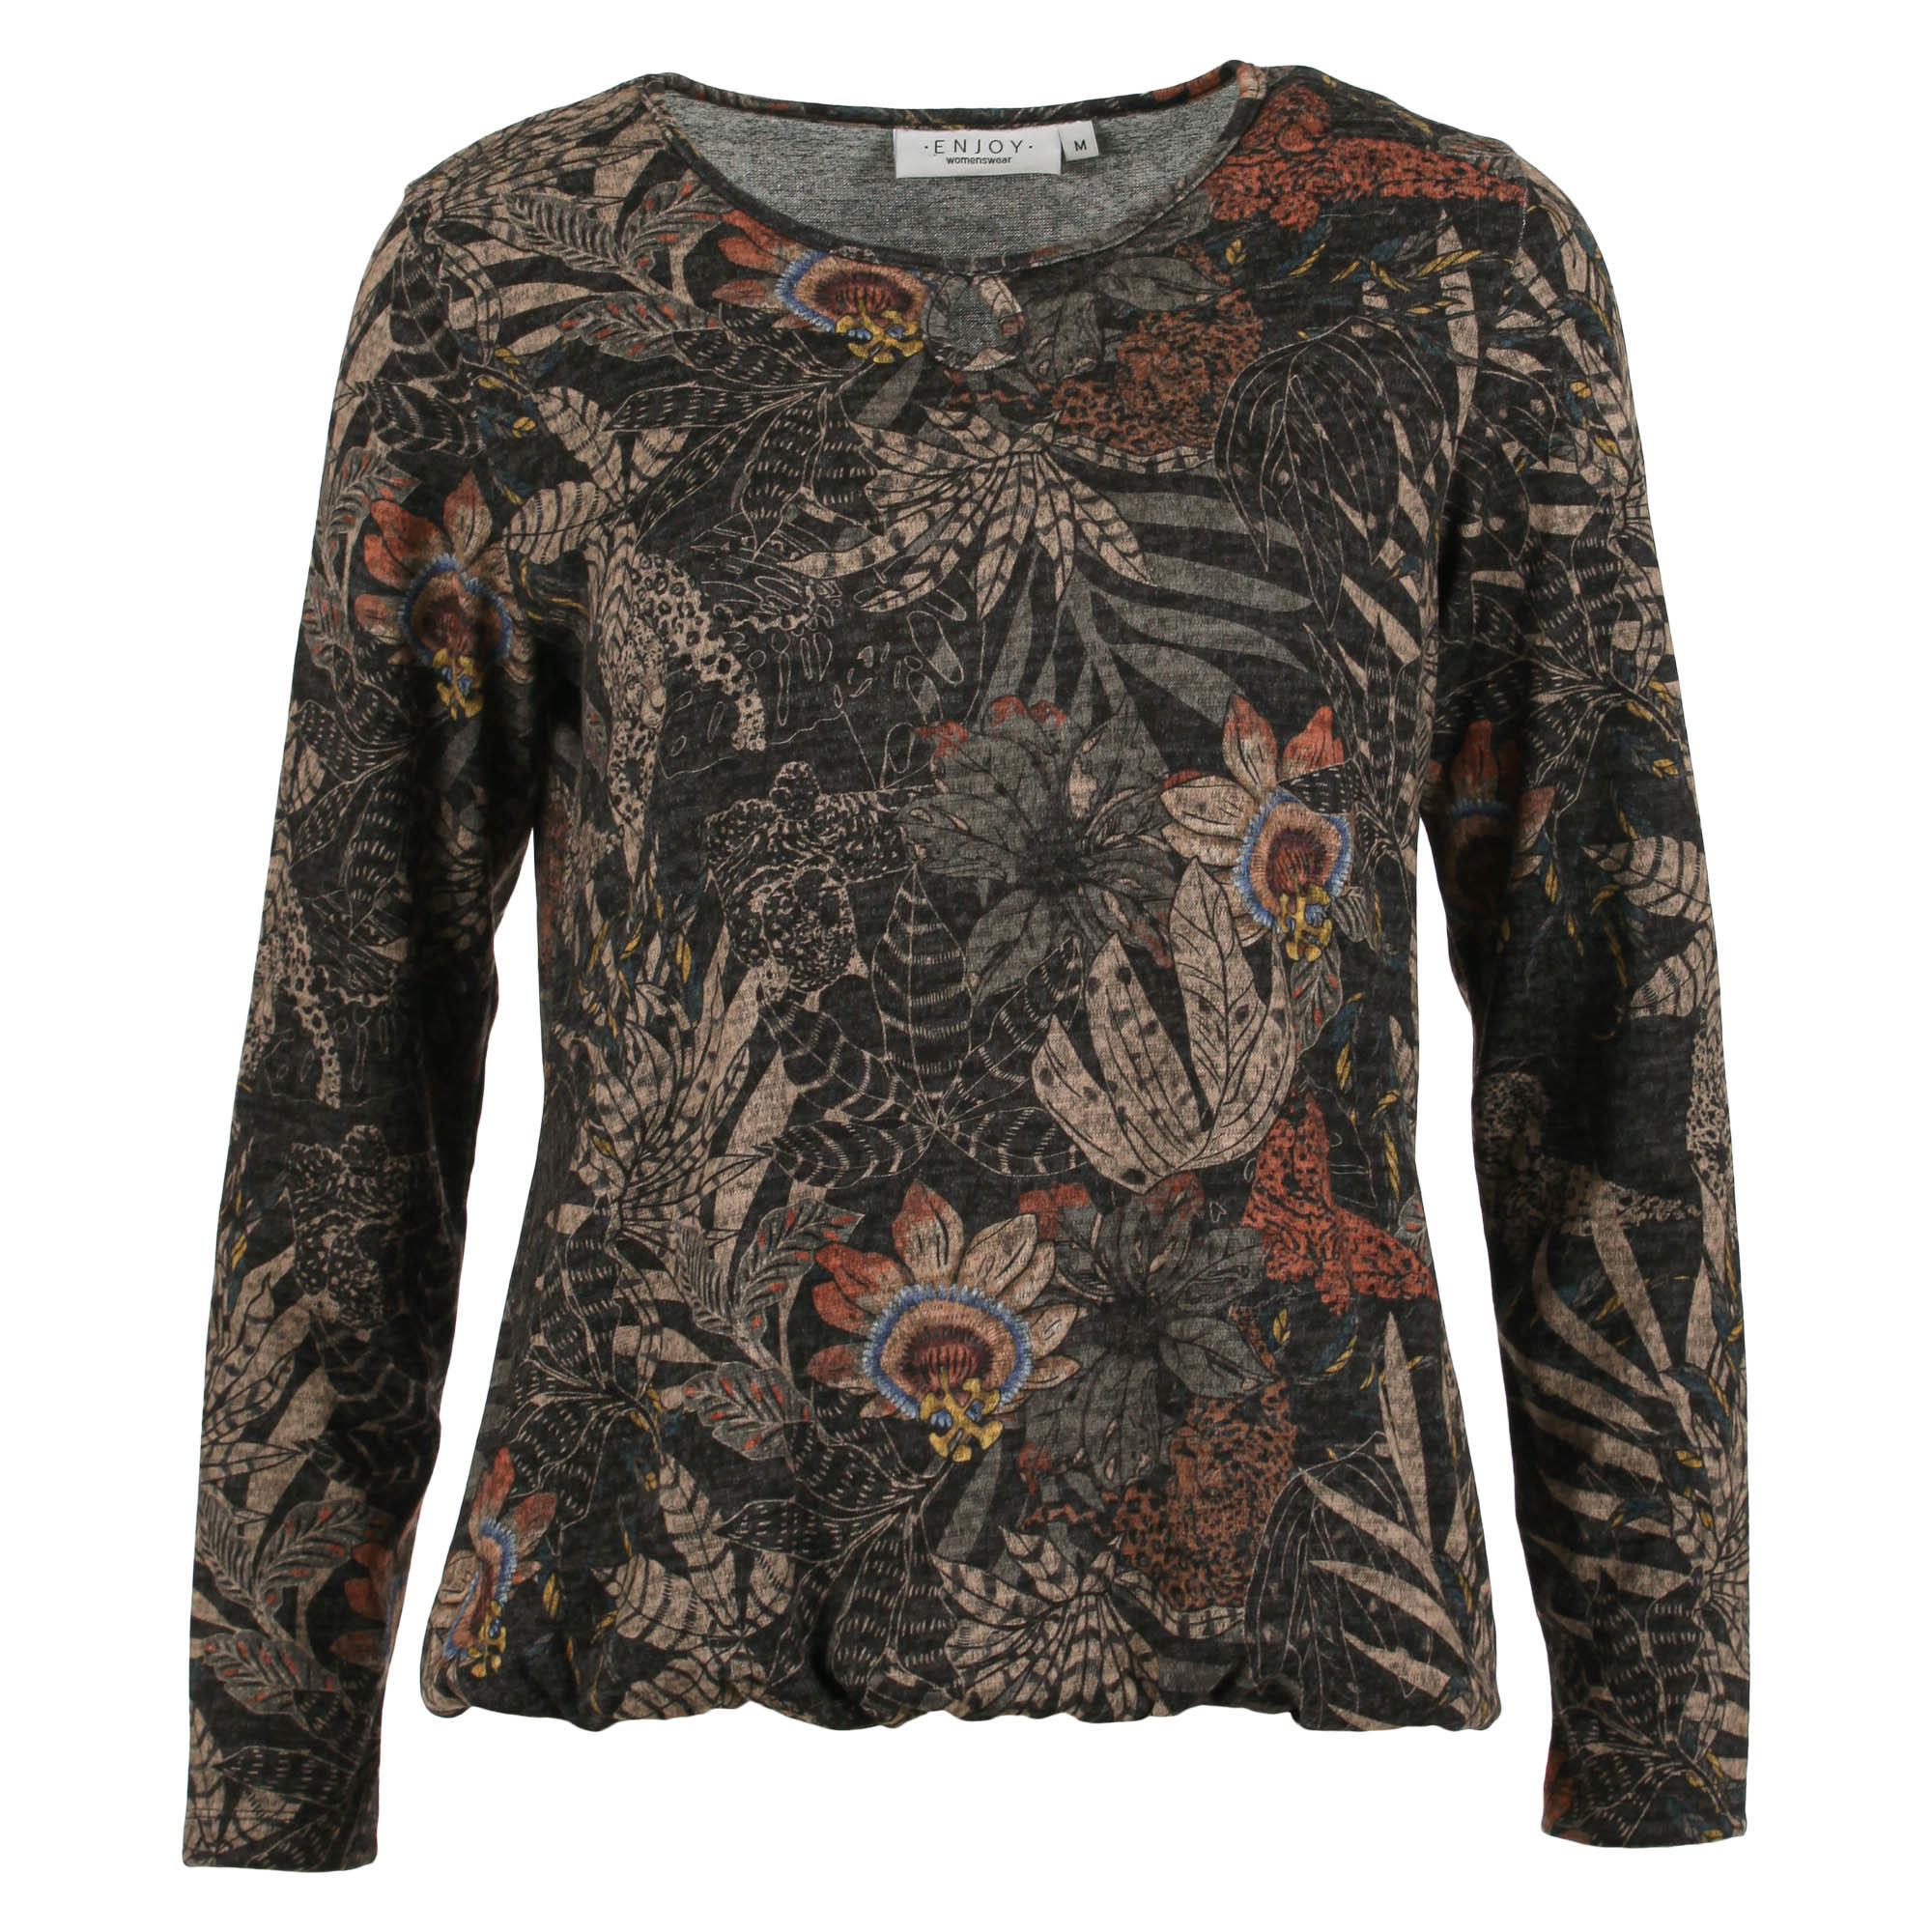 Enjoy Dames Sweater Allover print 183570-1